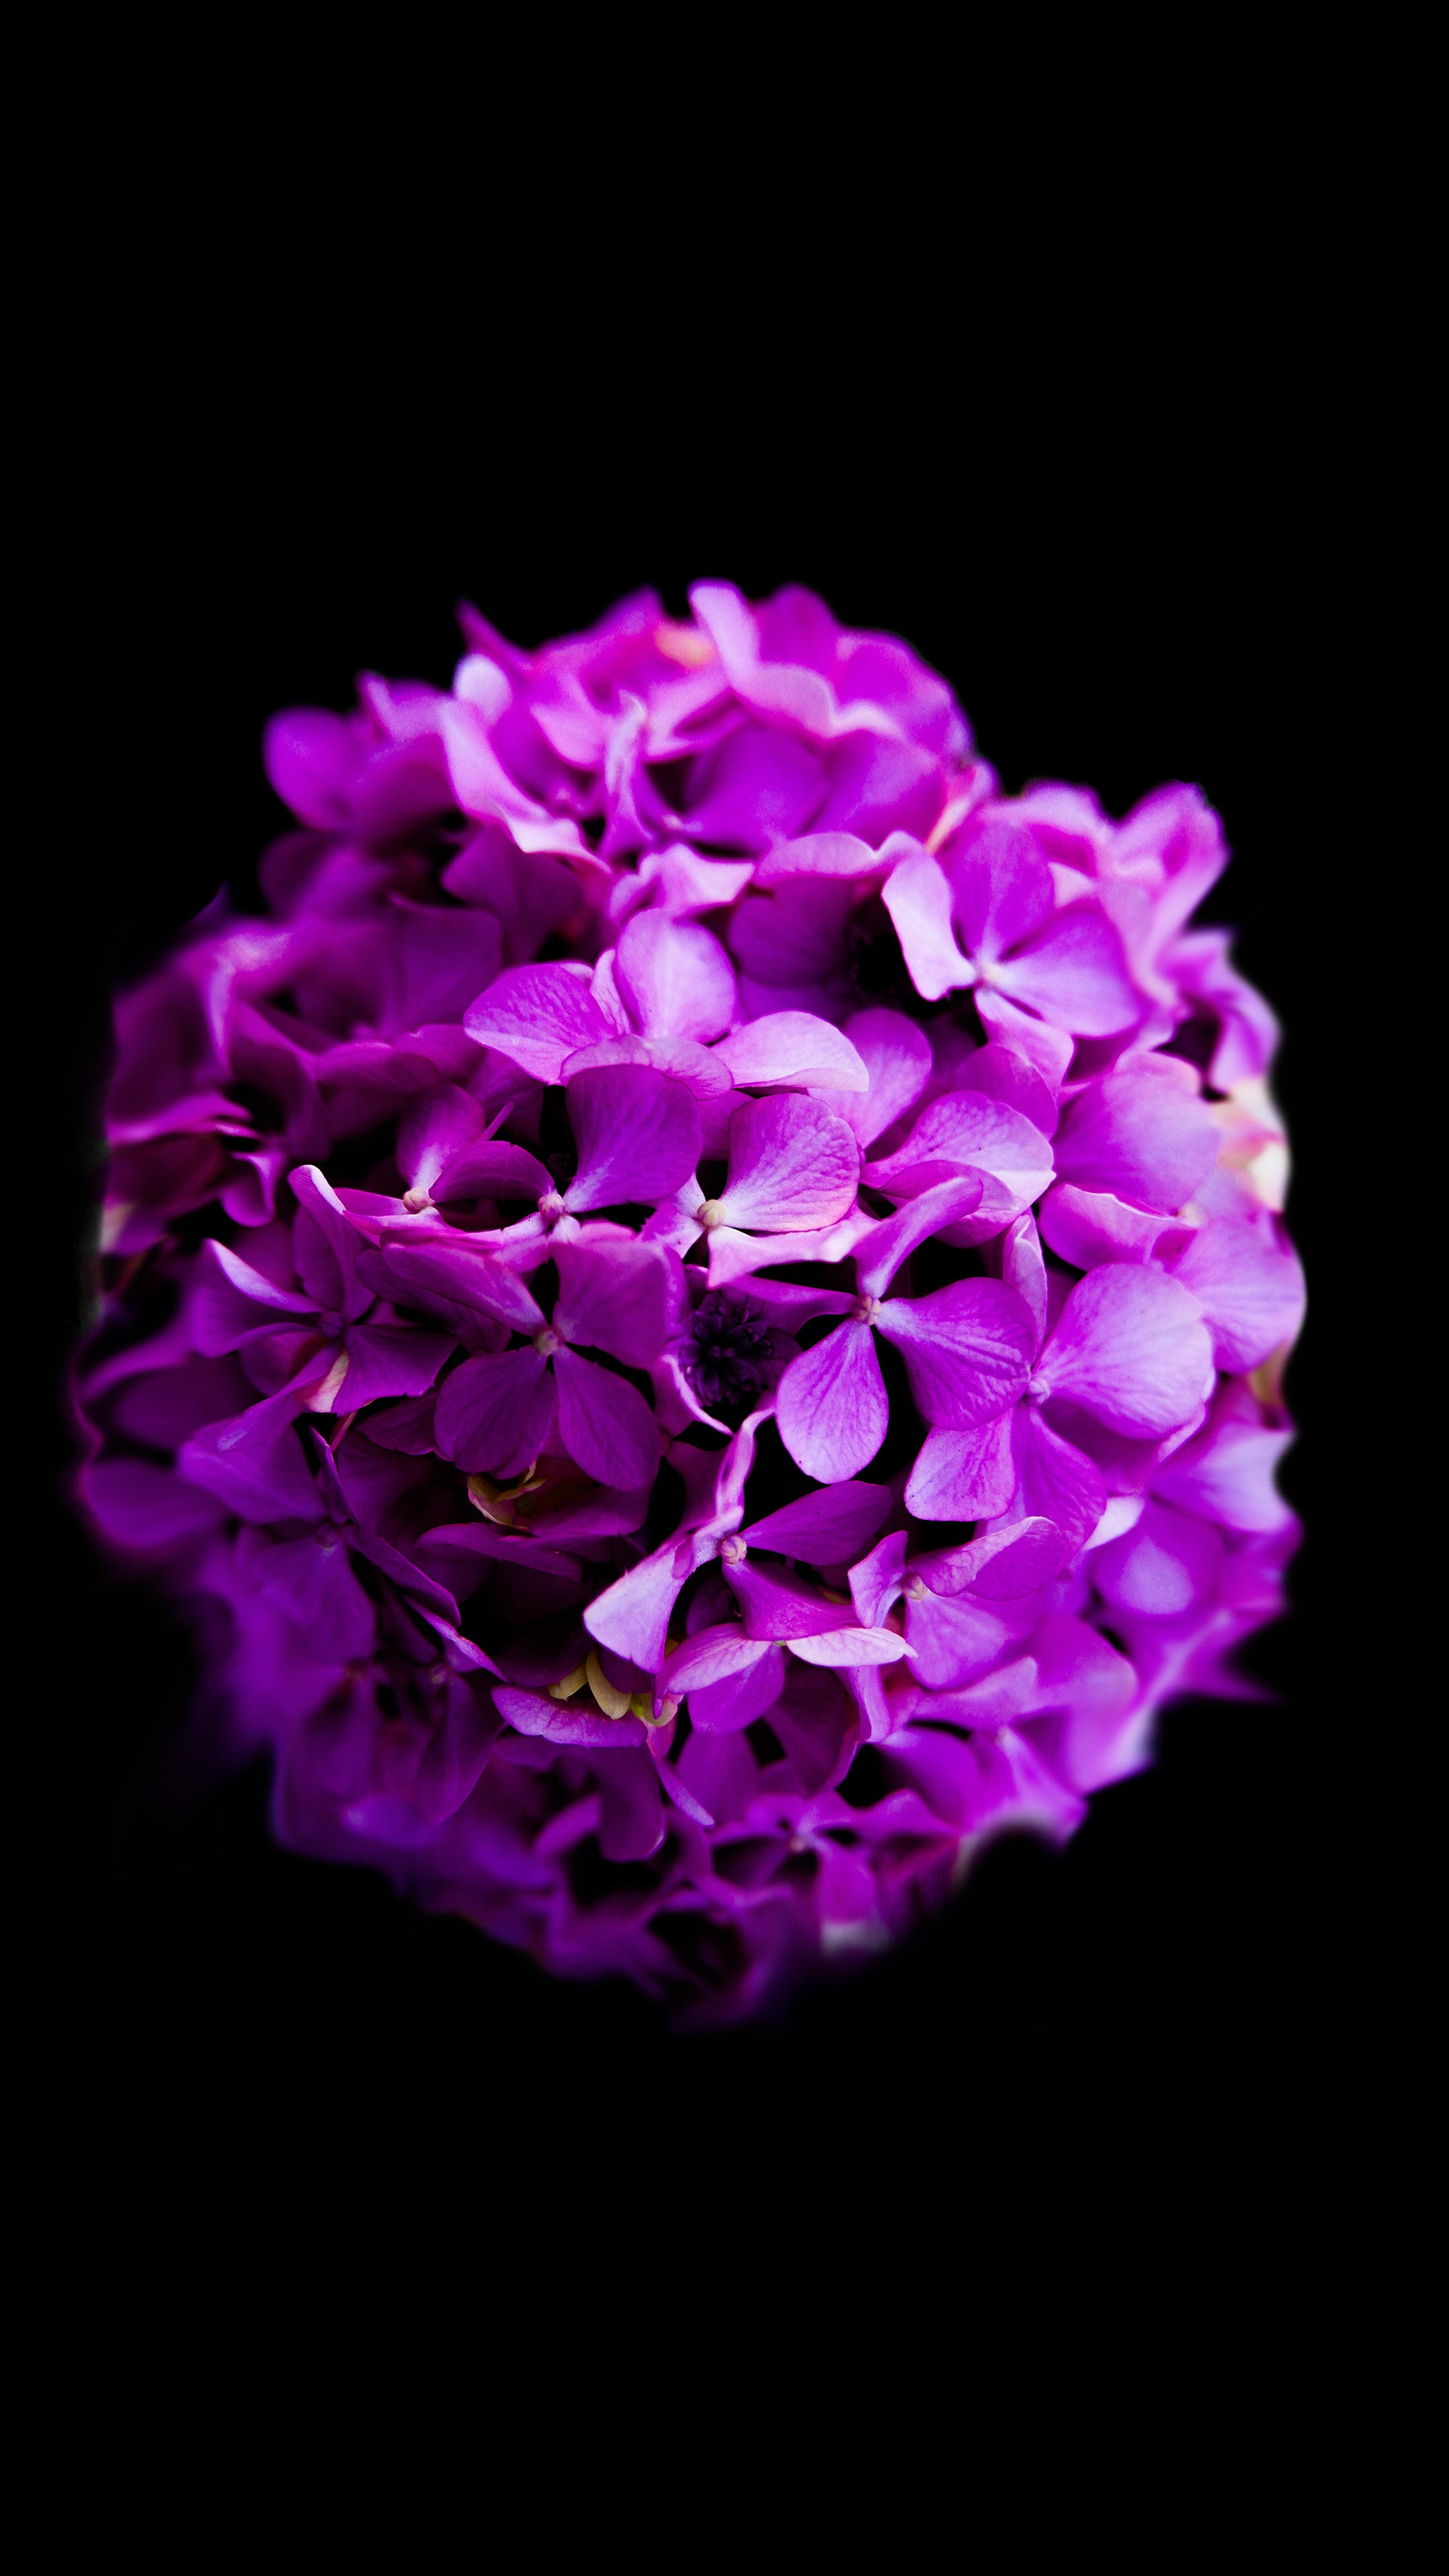 Kostnadsfri bild av blomma, blommor, delikat, flora